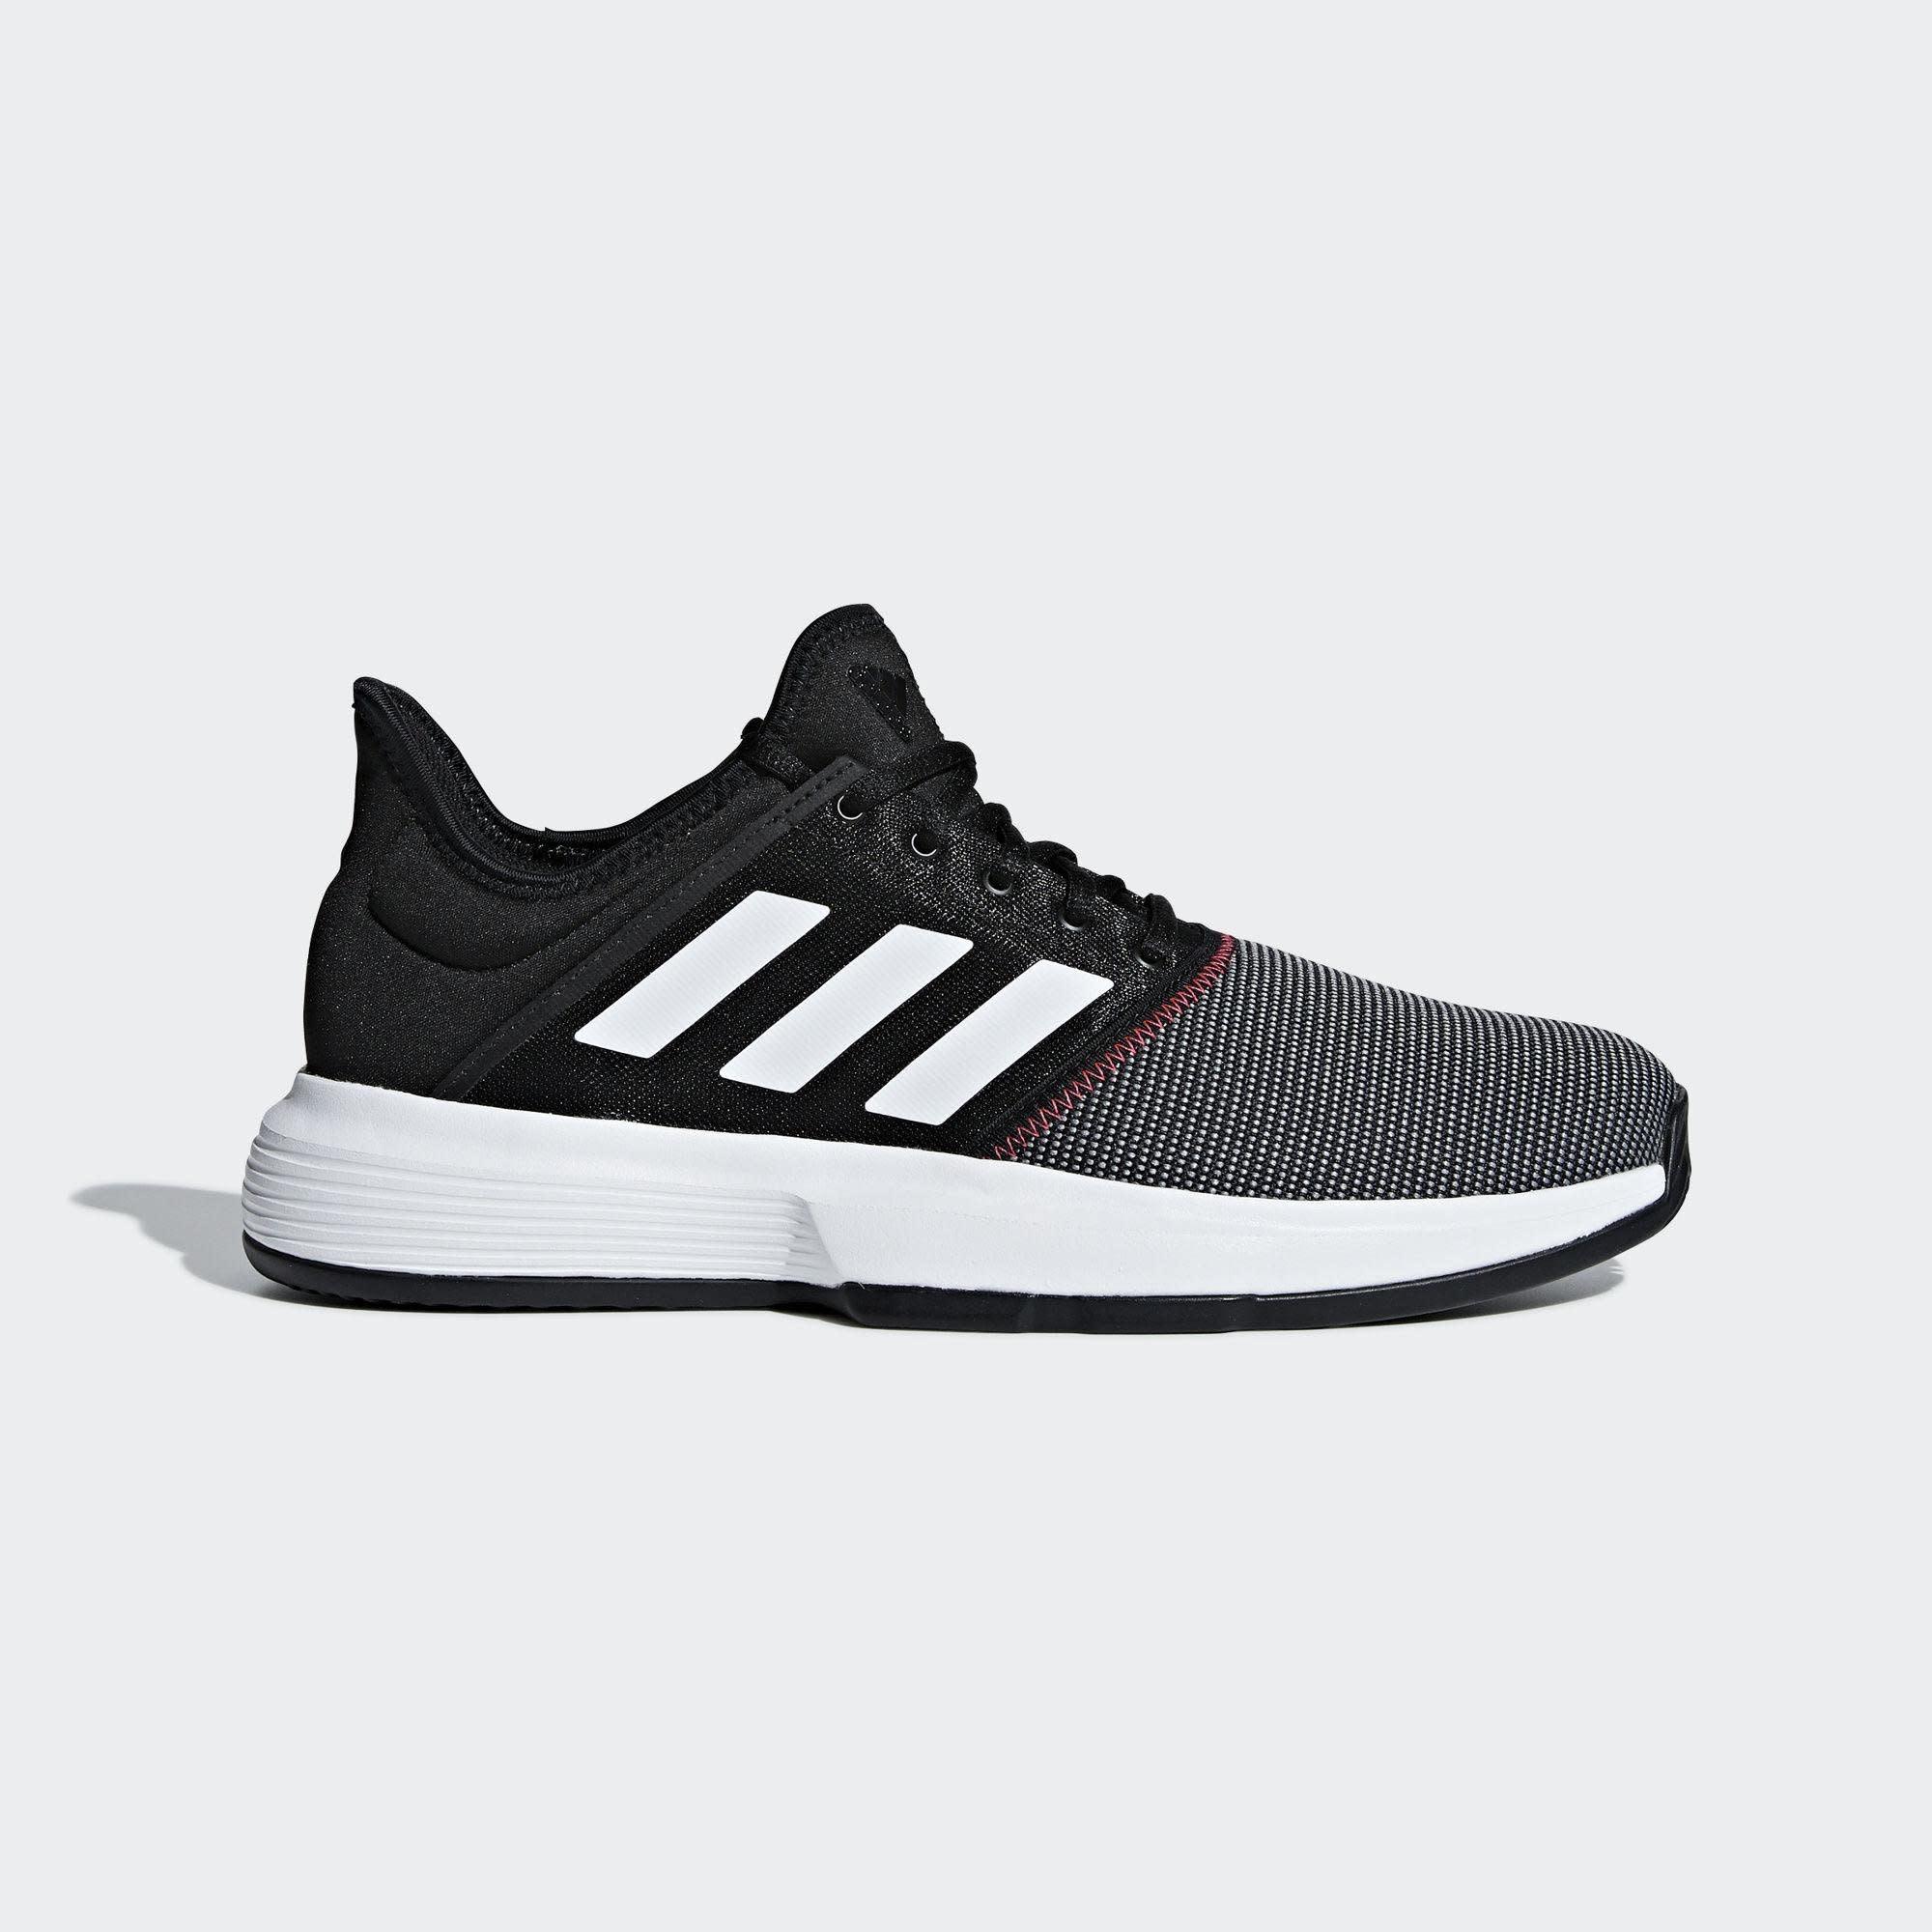 c4d9176b067 Adidas Game Court Mens Tennis Shoes (2019) - Gannon Sports